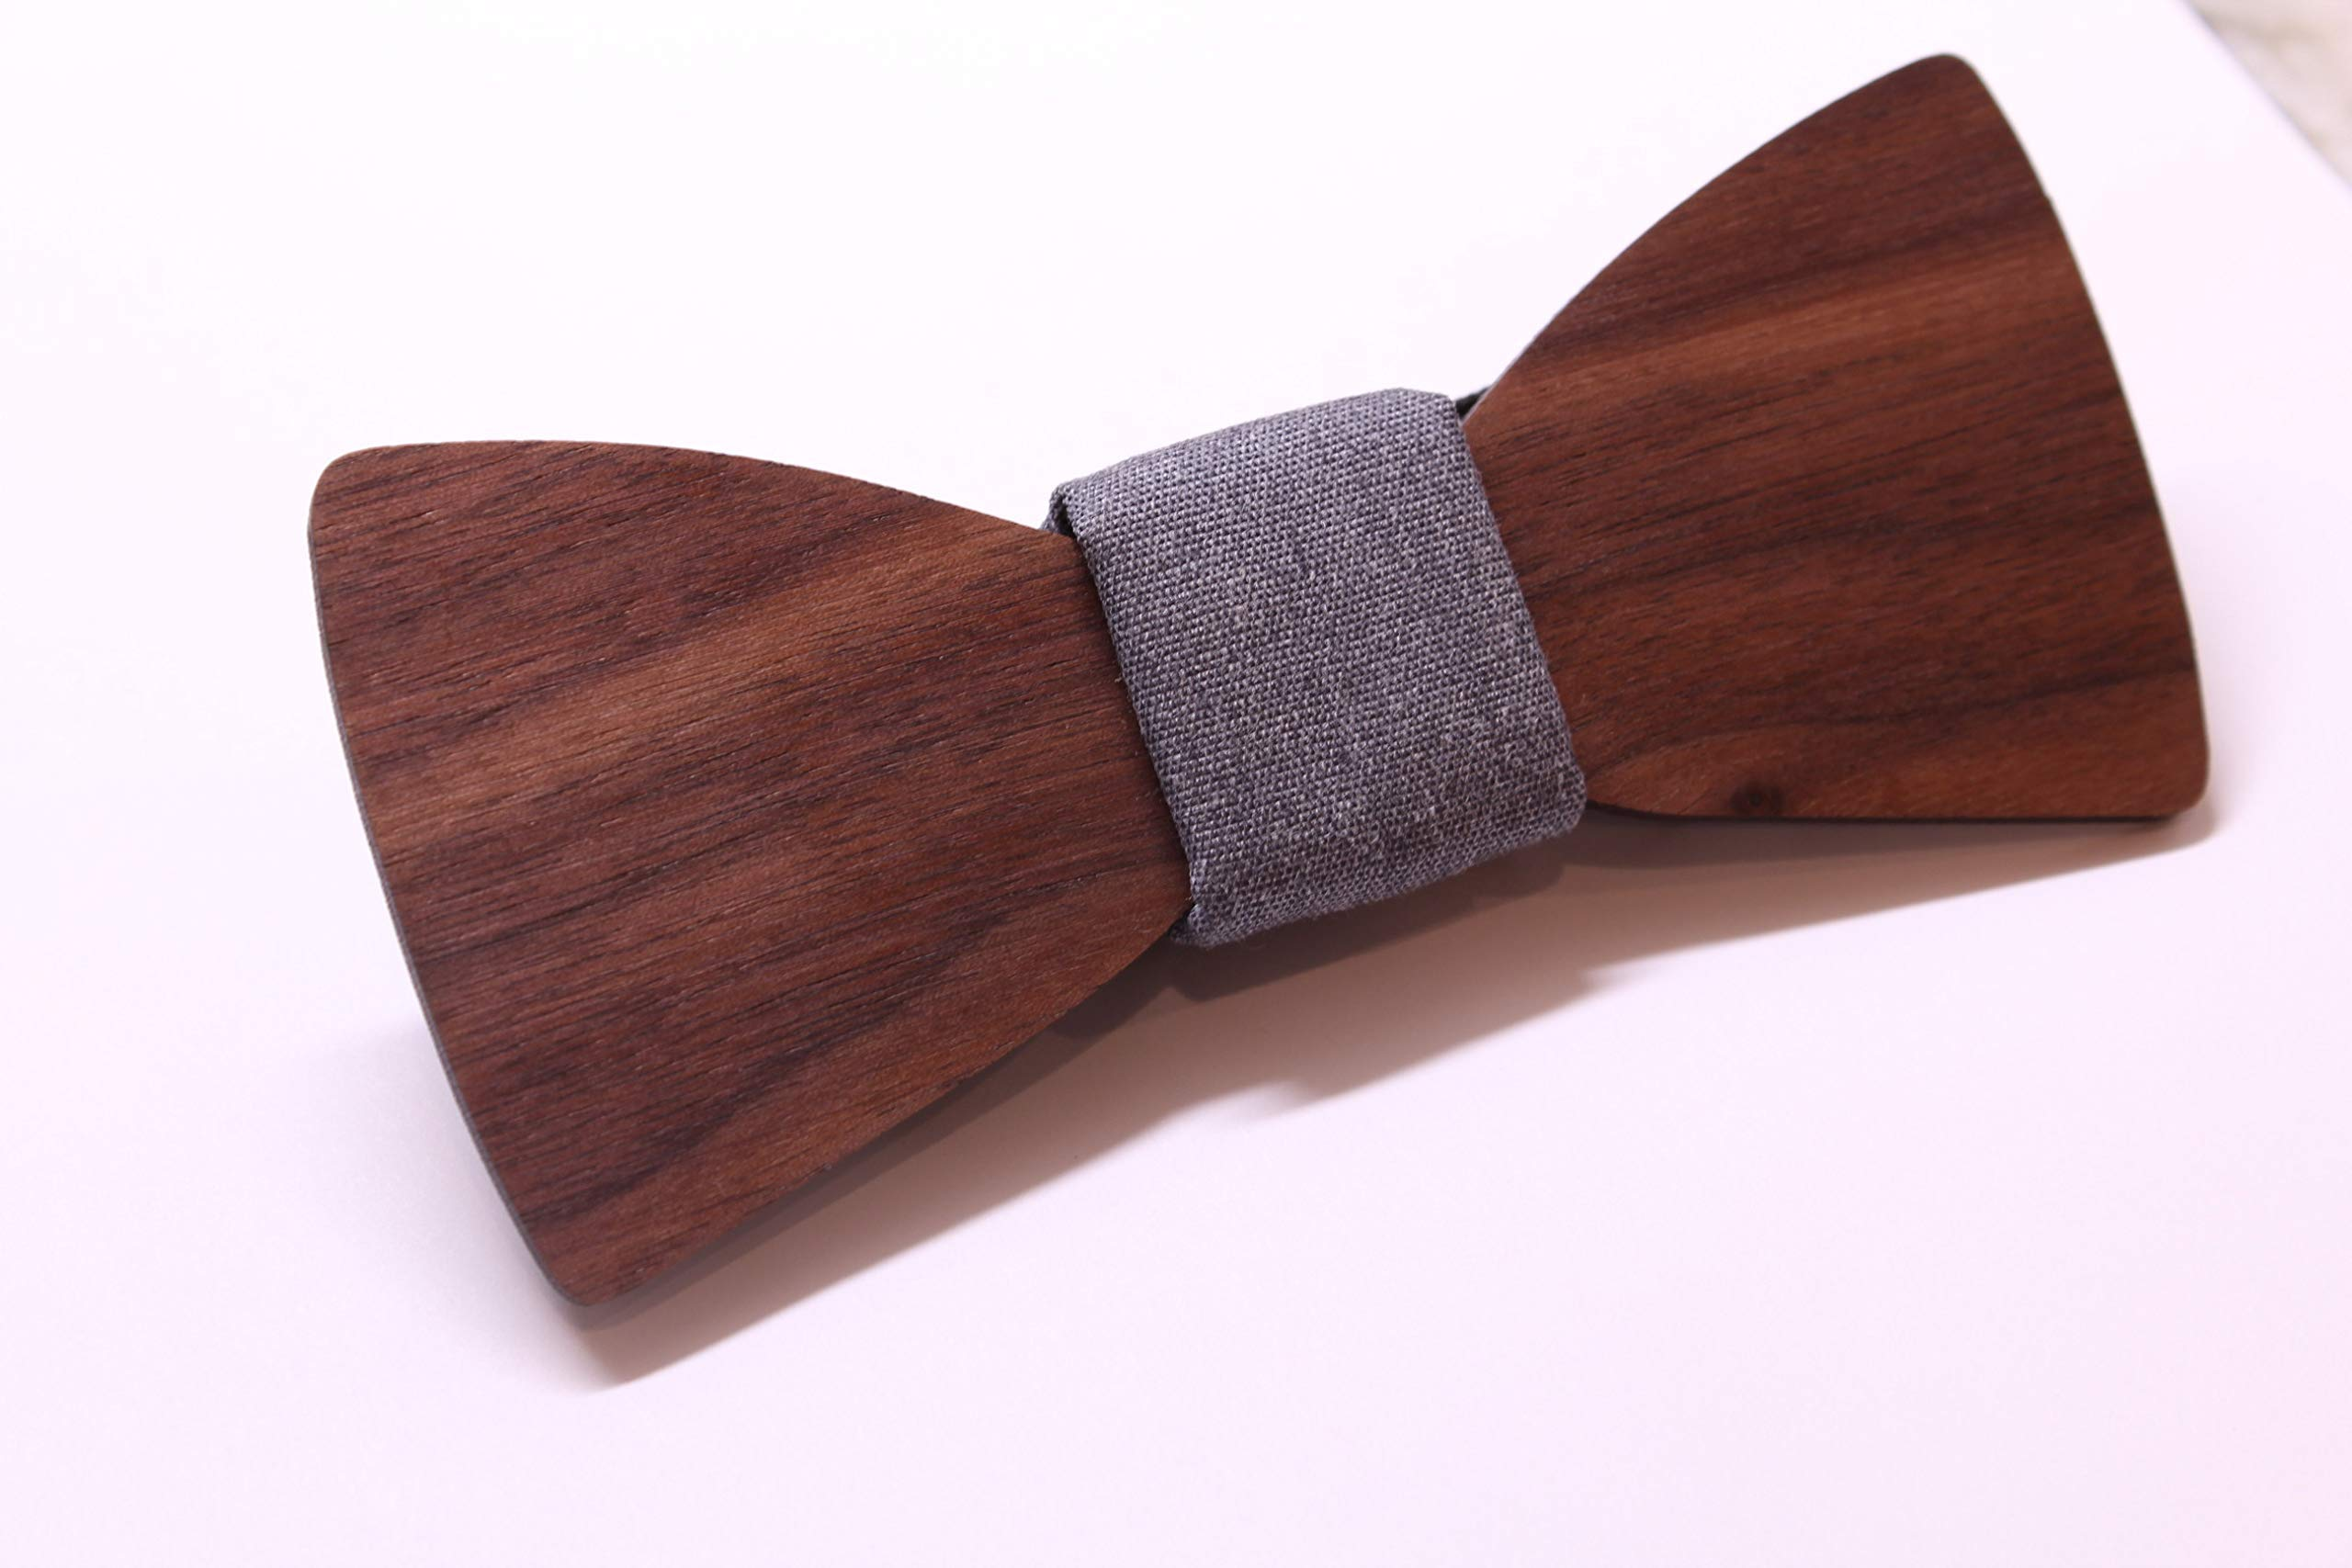 Bow Tie for Men, Wooden Bow Tie, Wedding Bowtie, Groomsmen Gift for Wedding